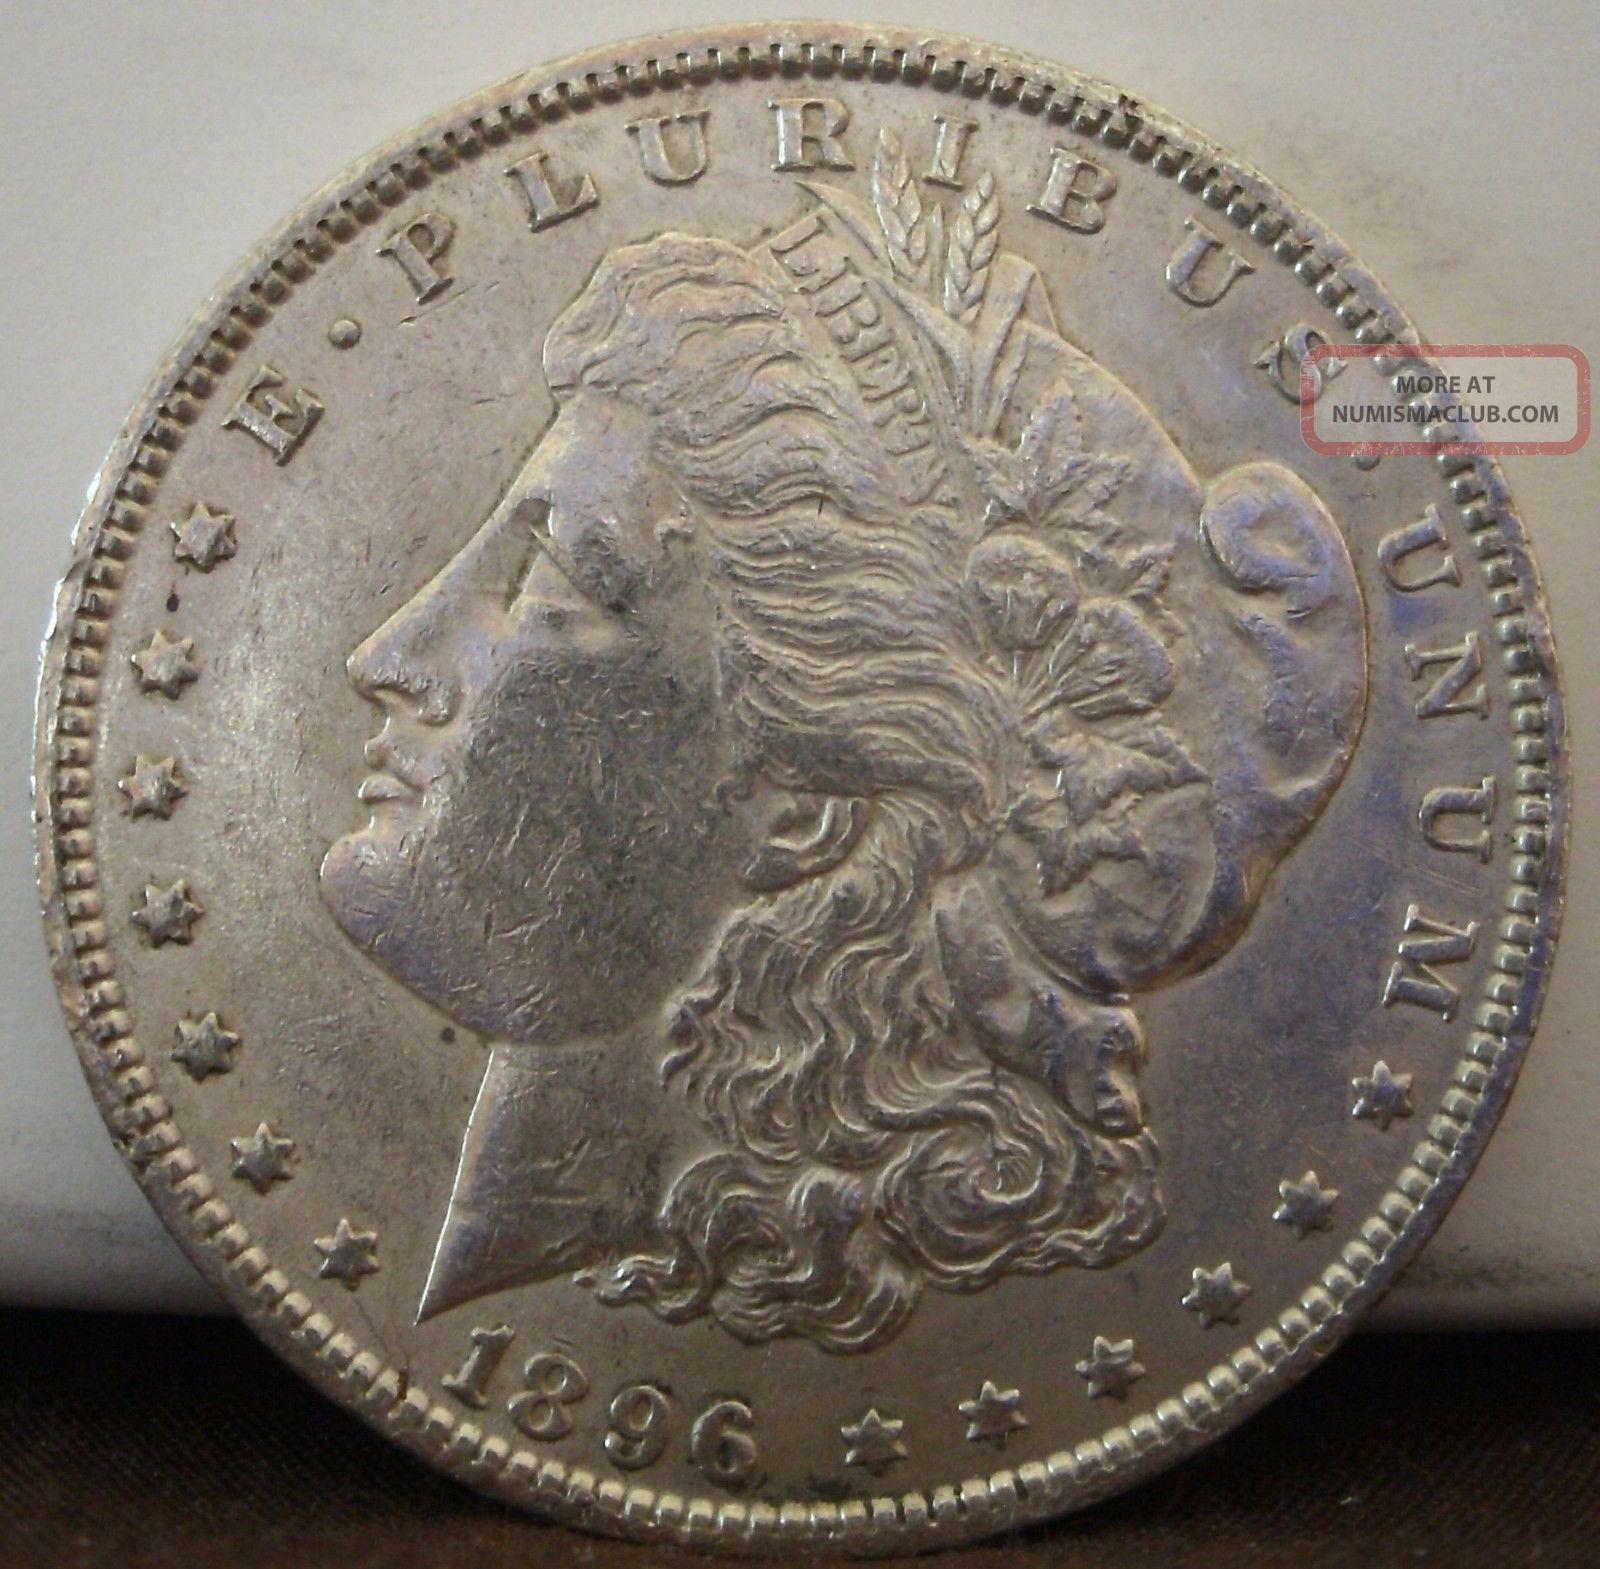 1896 $1 Morgan Silver Dollar 953 Dollars photo